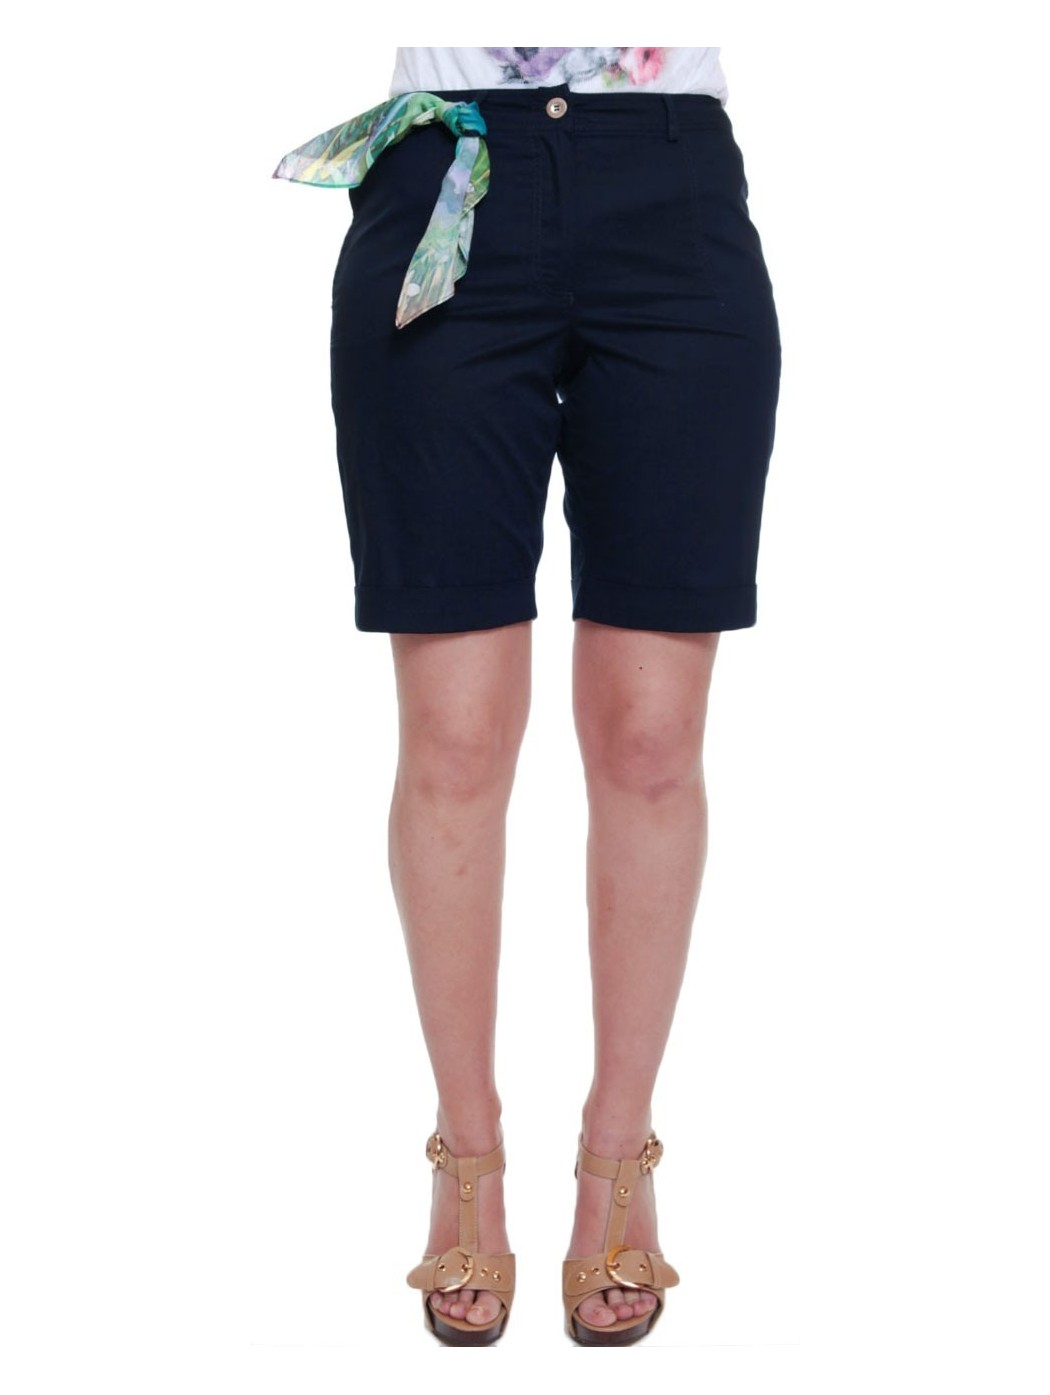 Concept K bermuda shorts